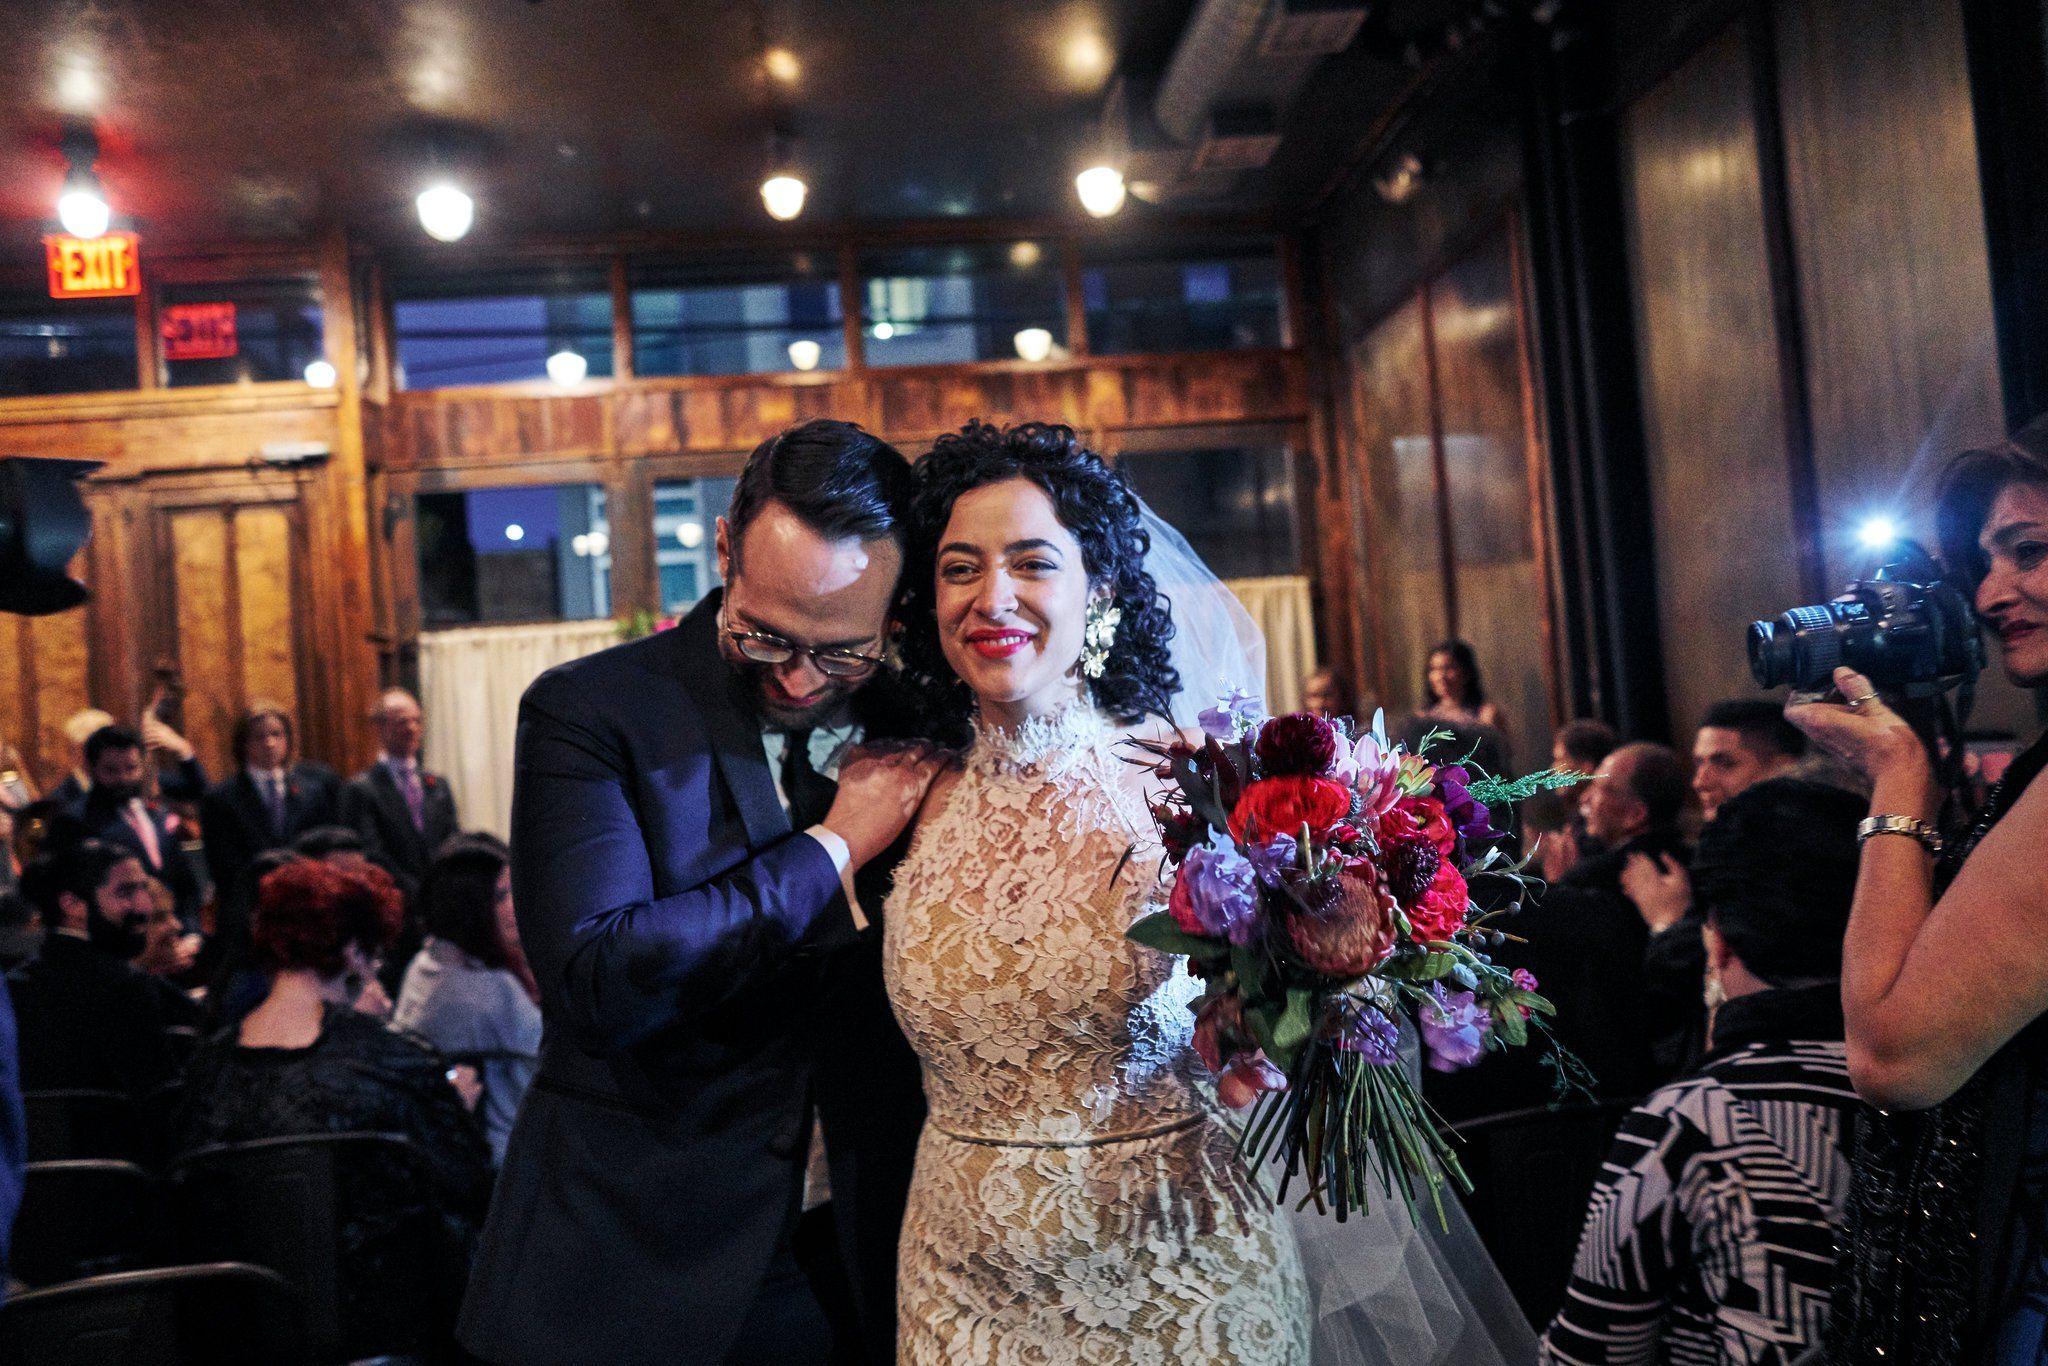 On Craigslist 3br Unfinished Future Husband Upstairs With Images New York Wedding Venues New York Wedding Wedding